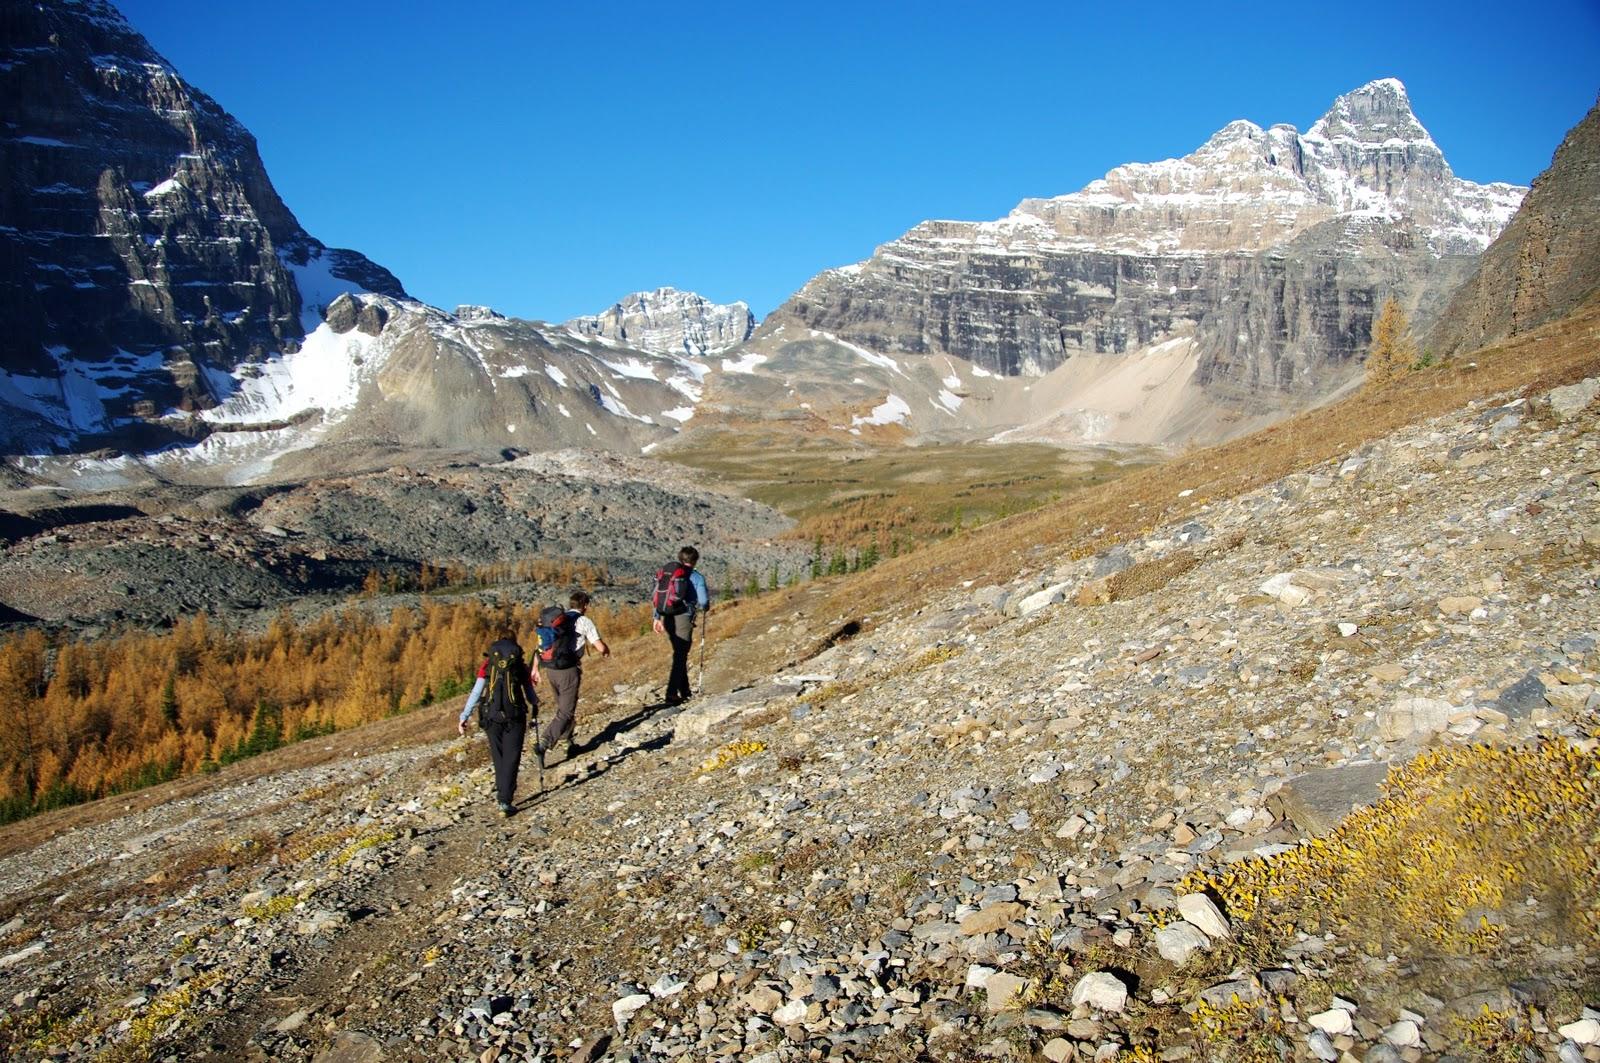 http://2.bp.blogspot.com/_DDxVPezKDMo/TKjkRDrGZAI/AAAAAAAAEKg/CyzWbmnGpJU/s1600/9637+strolling+into+the+valley.jpg